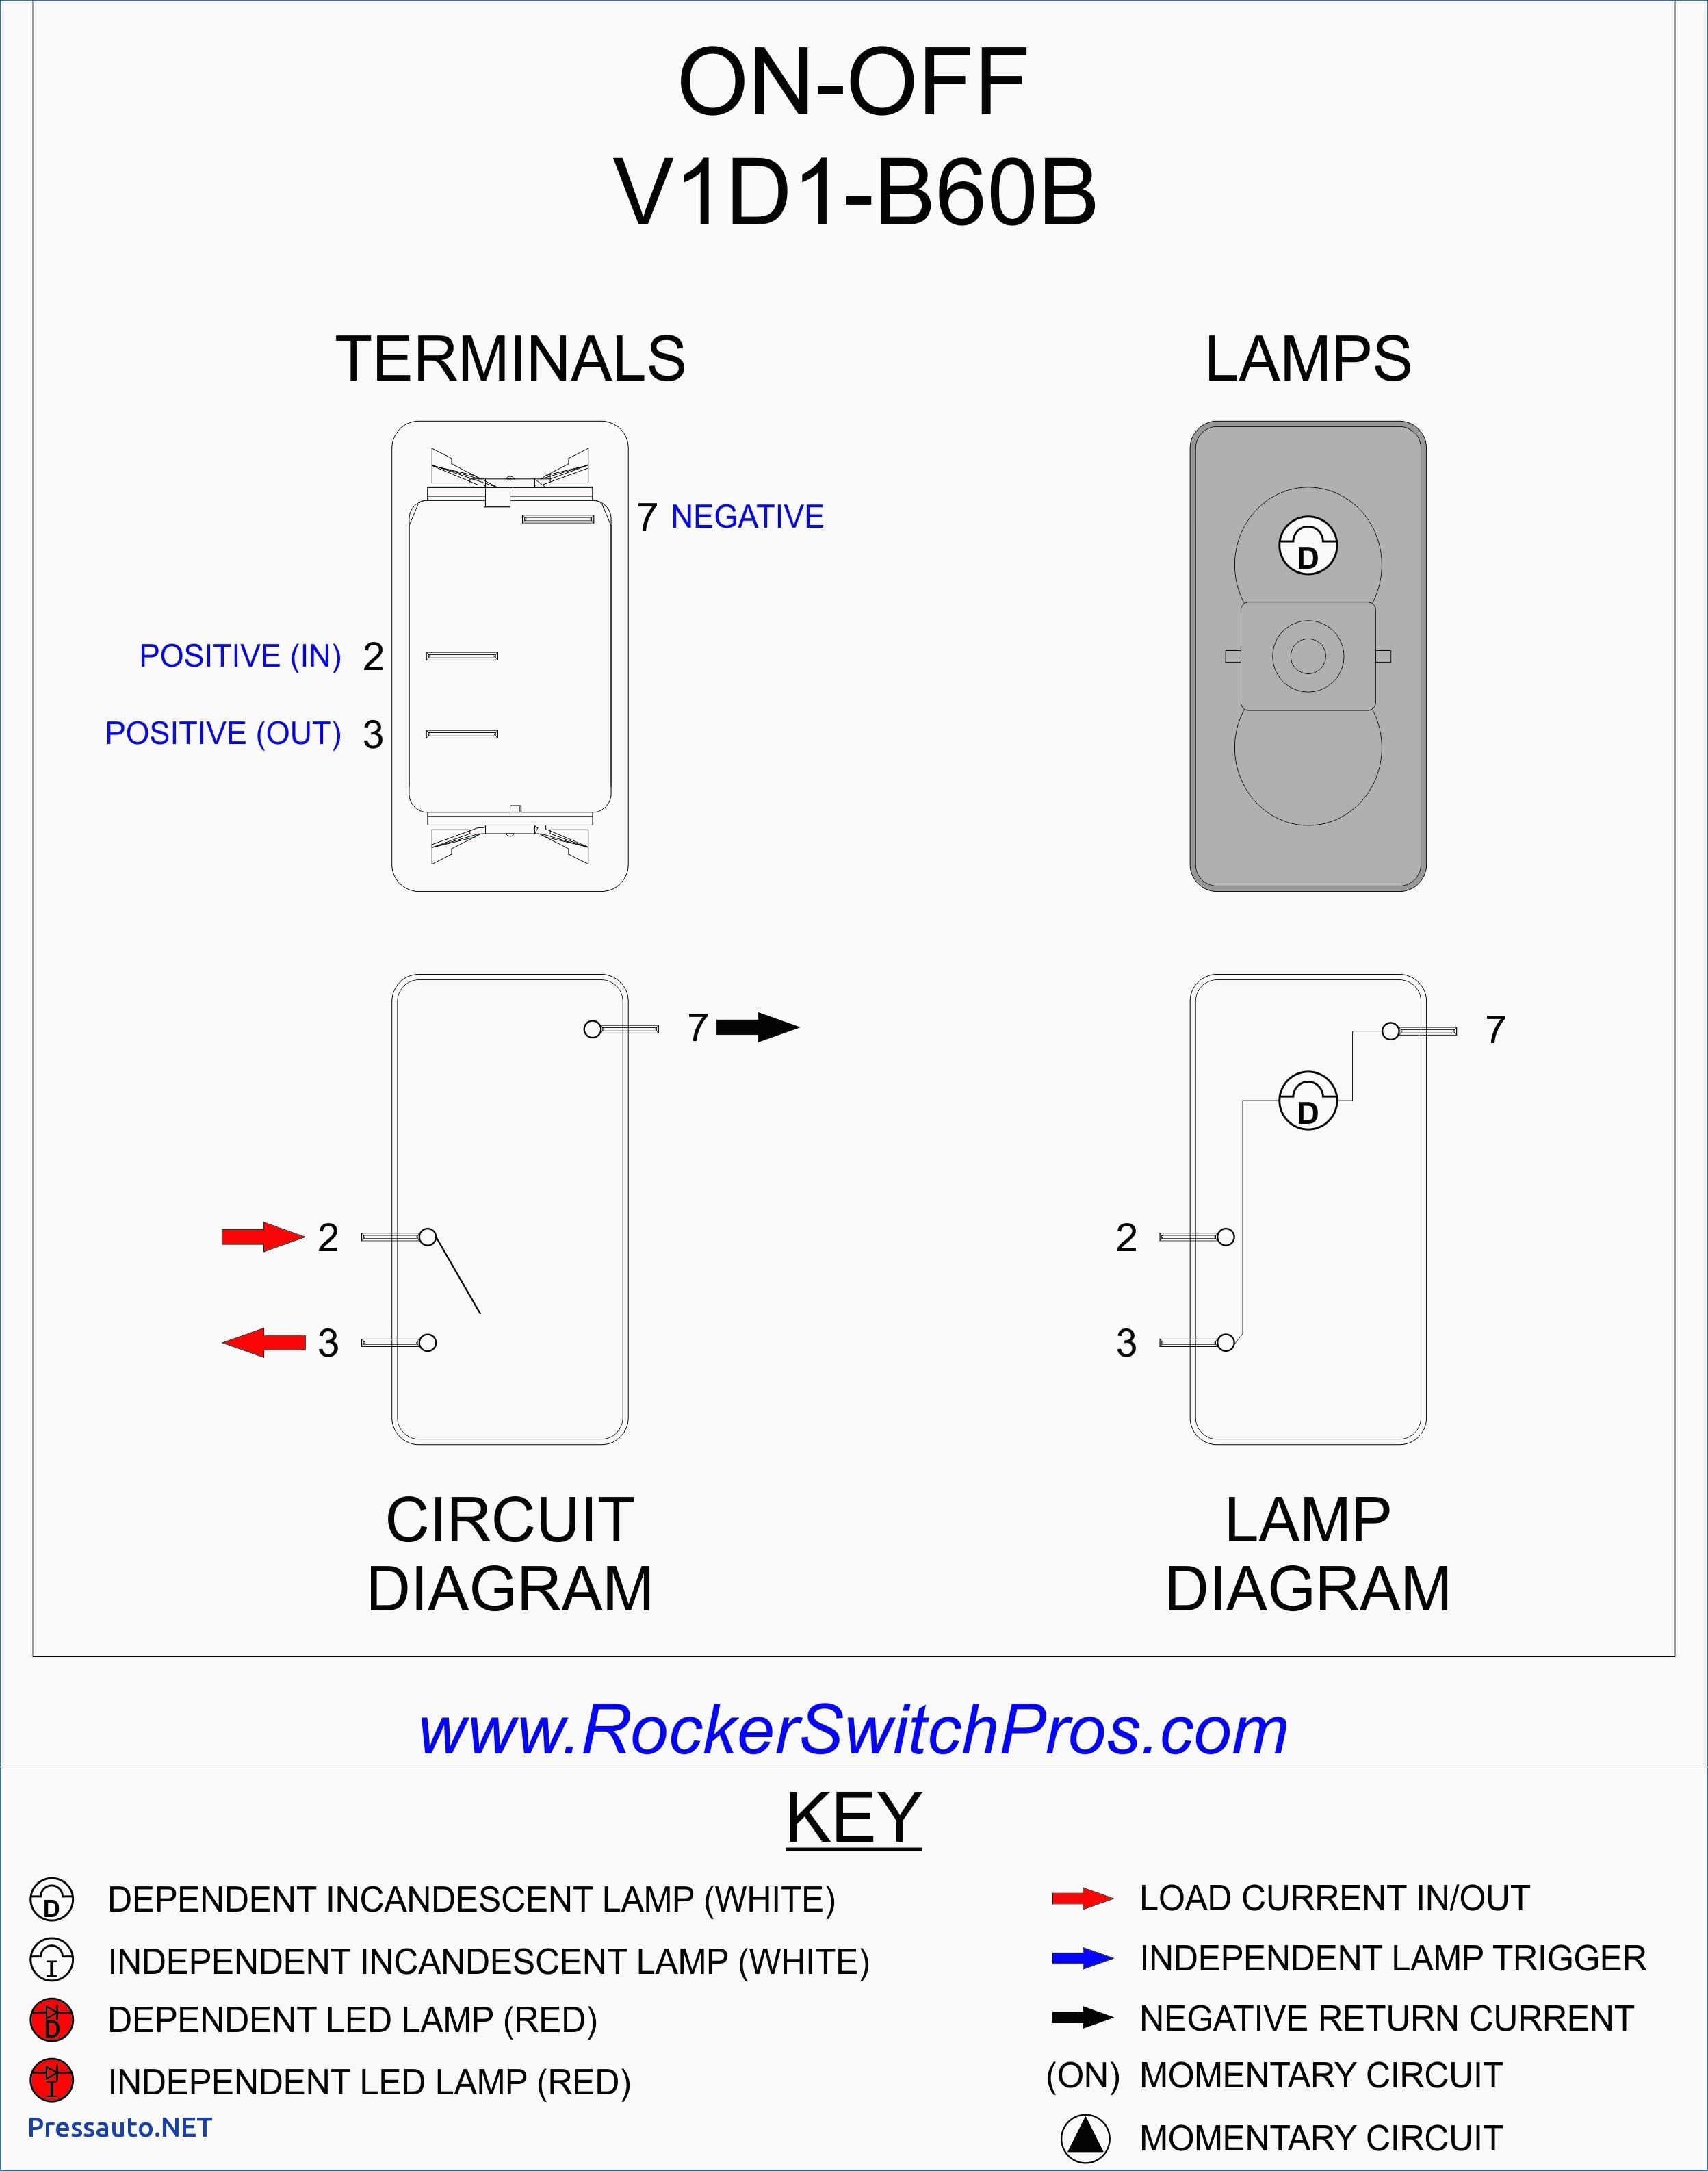 wiring diagram carling wiring diagramcarling technologies rocker switch wiring diagram free wiring diagramcarling technologies rocker switch wiring diagram carling technologies